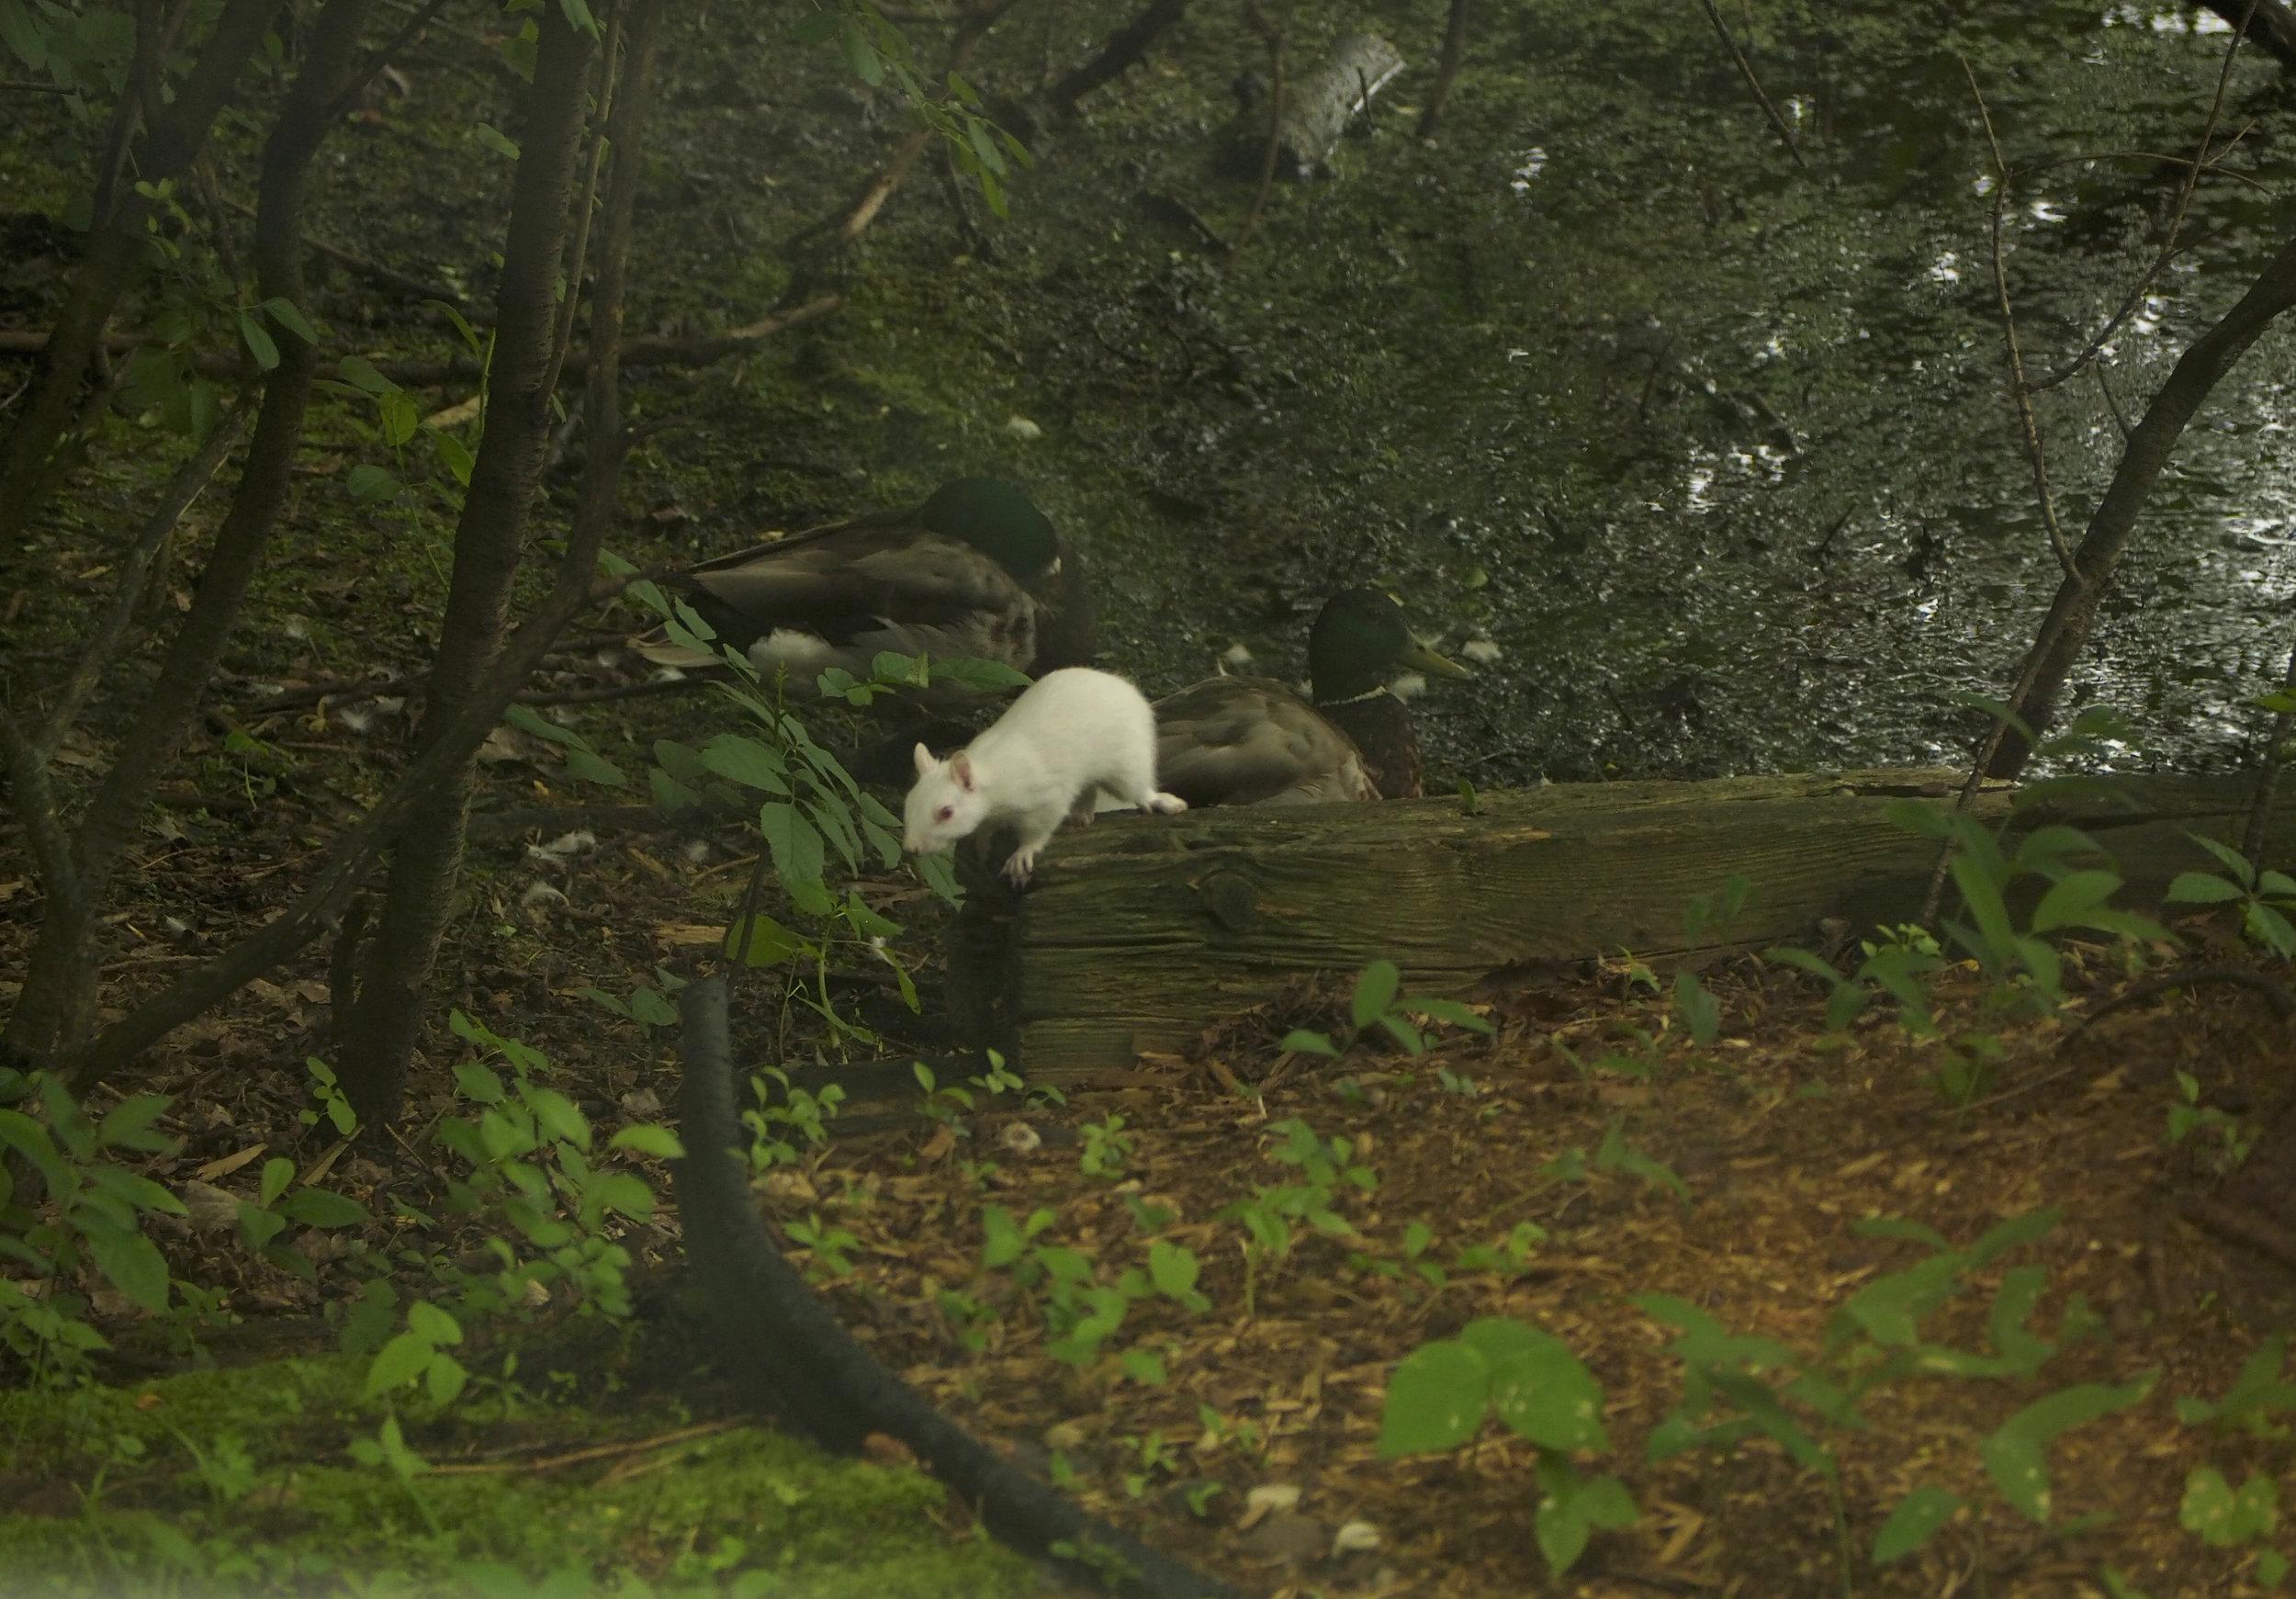 cindi_albino_squirrel_spiritedtable_photo3.jpg